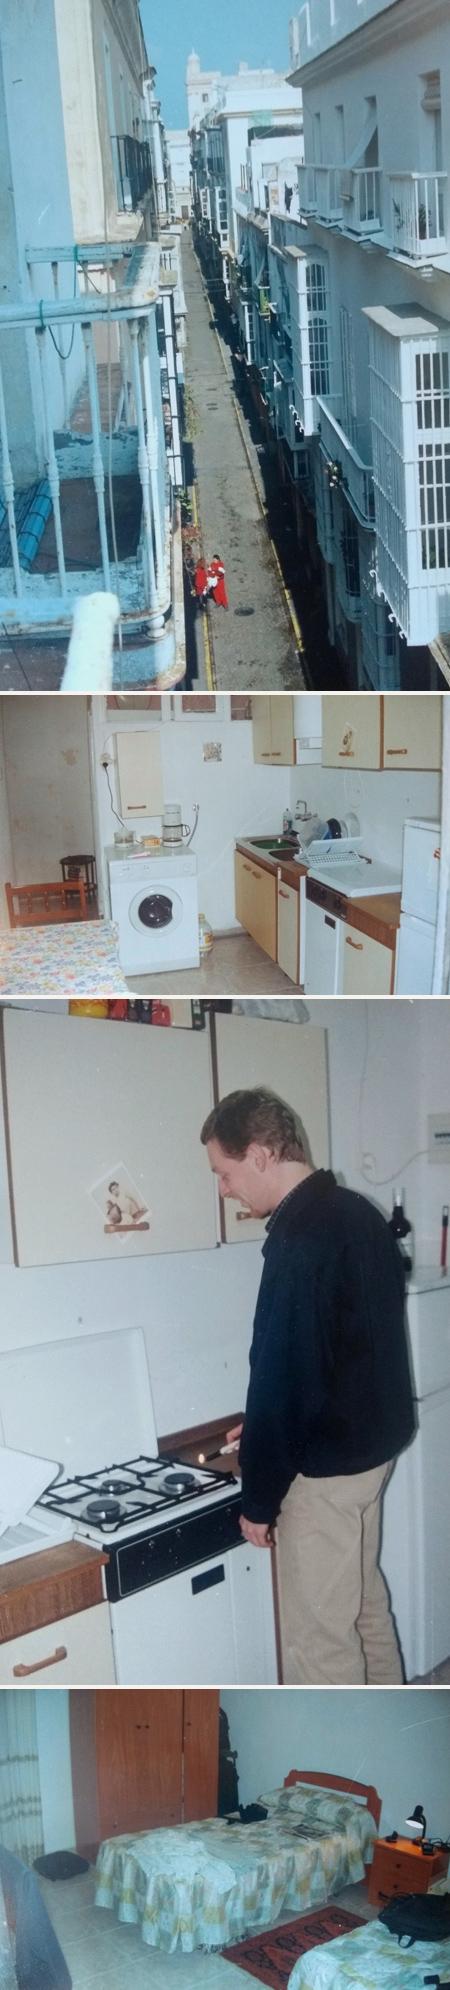 places lived, Cádiz, 1998, Spain, España